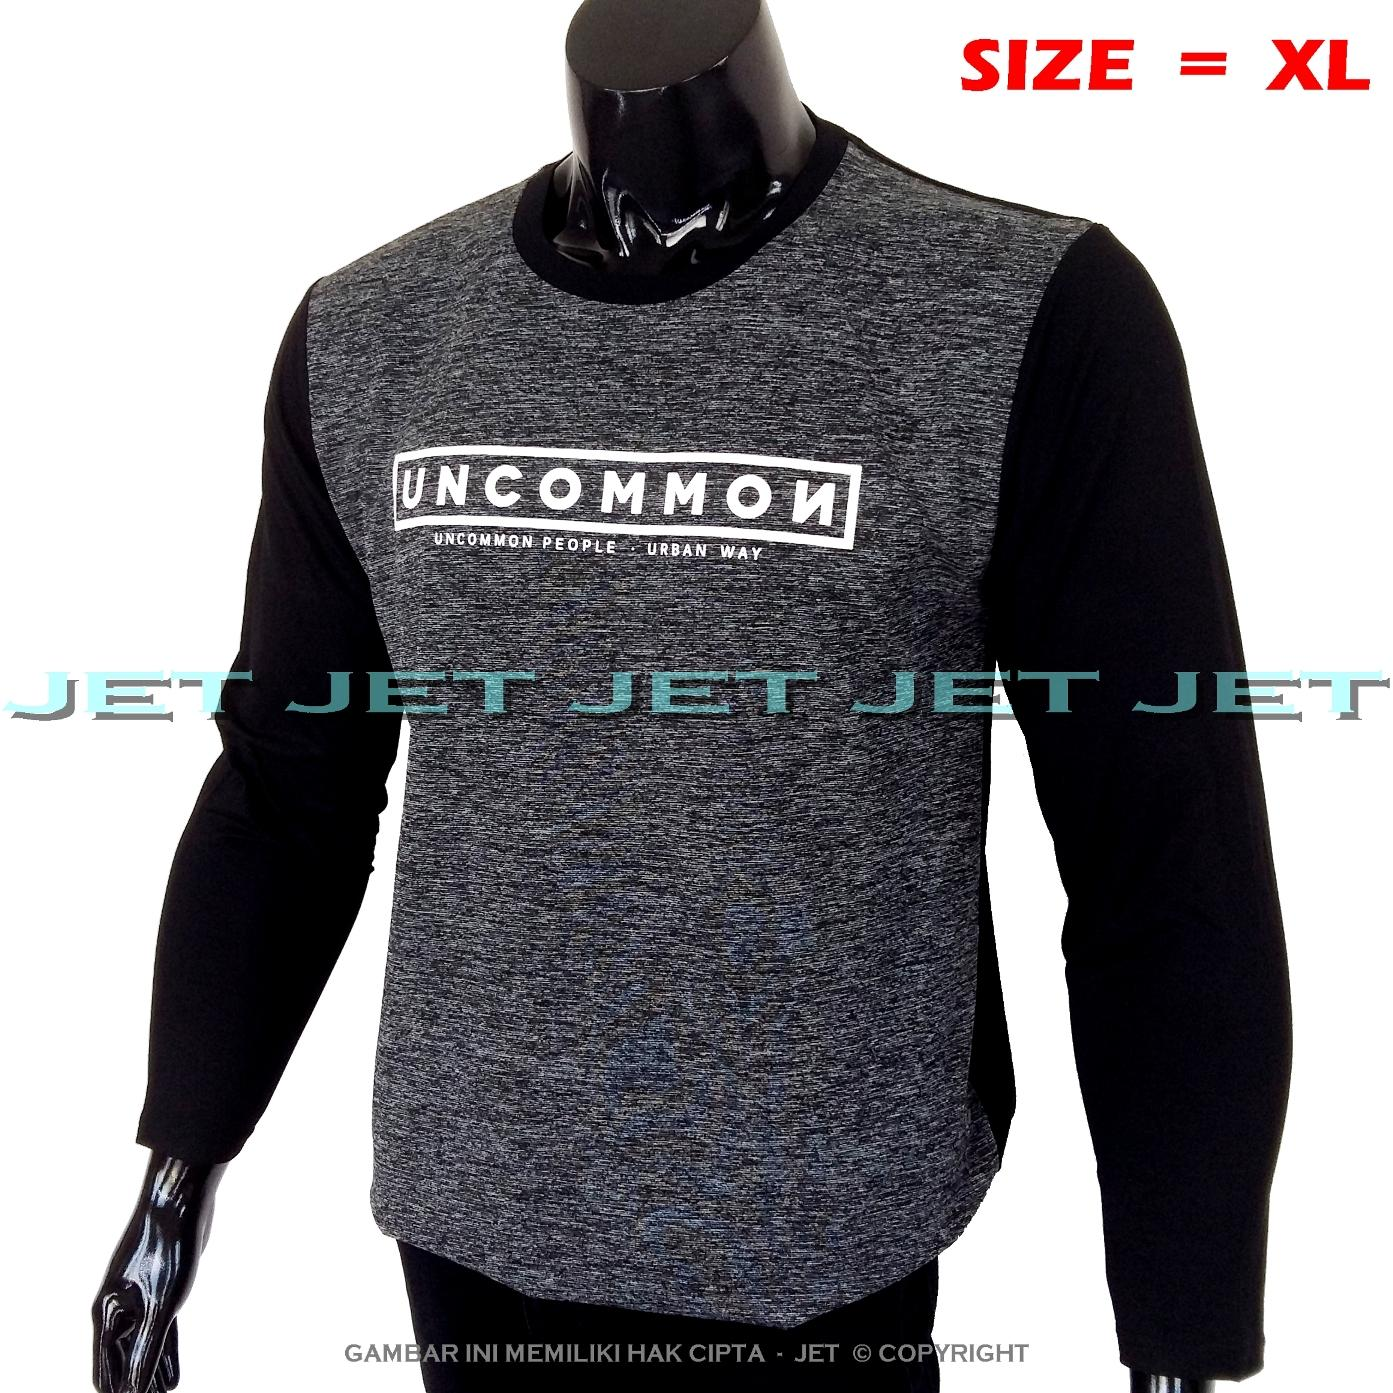 JeT - Kaos Distro UNCOMMON Size XL Dewasa Lengan Panjang Soft Rayon Viscose Lycra Tidak Pasaran Sablonan Eropa Gradasi